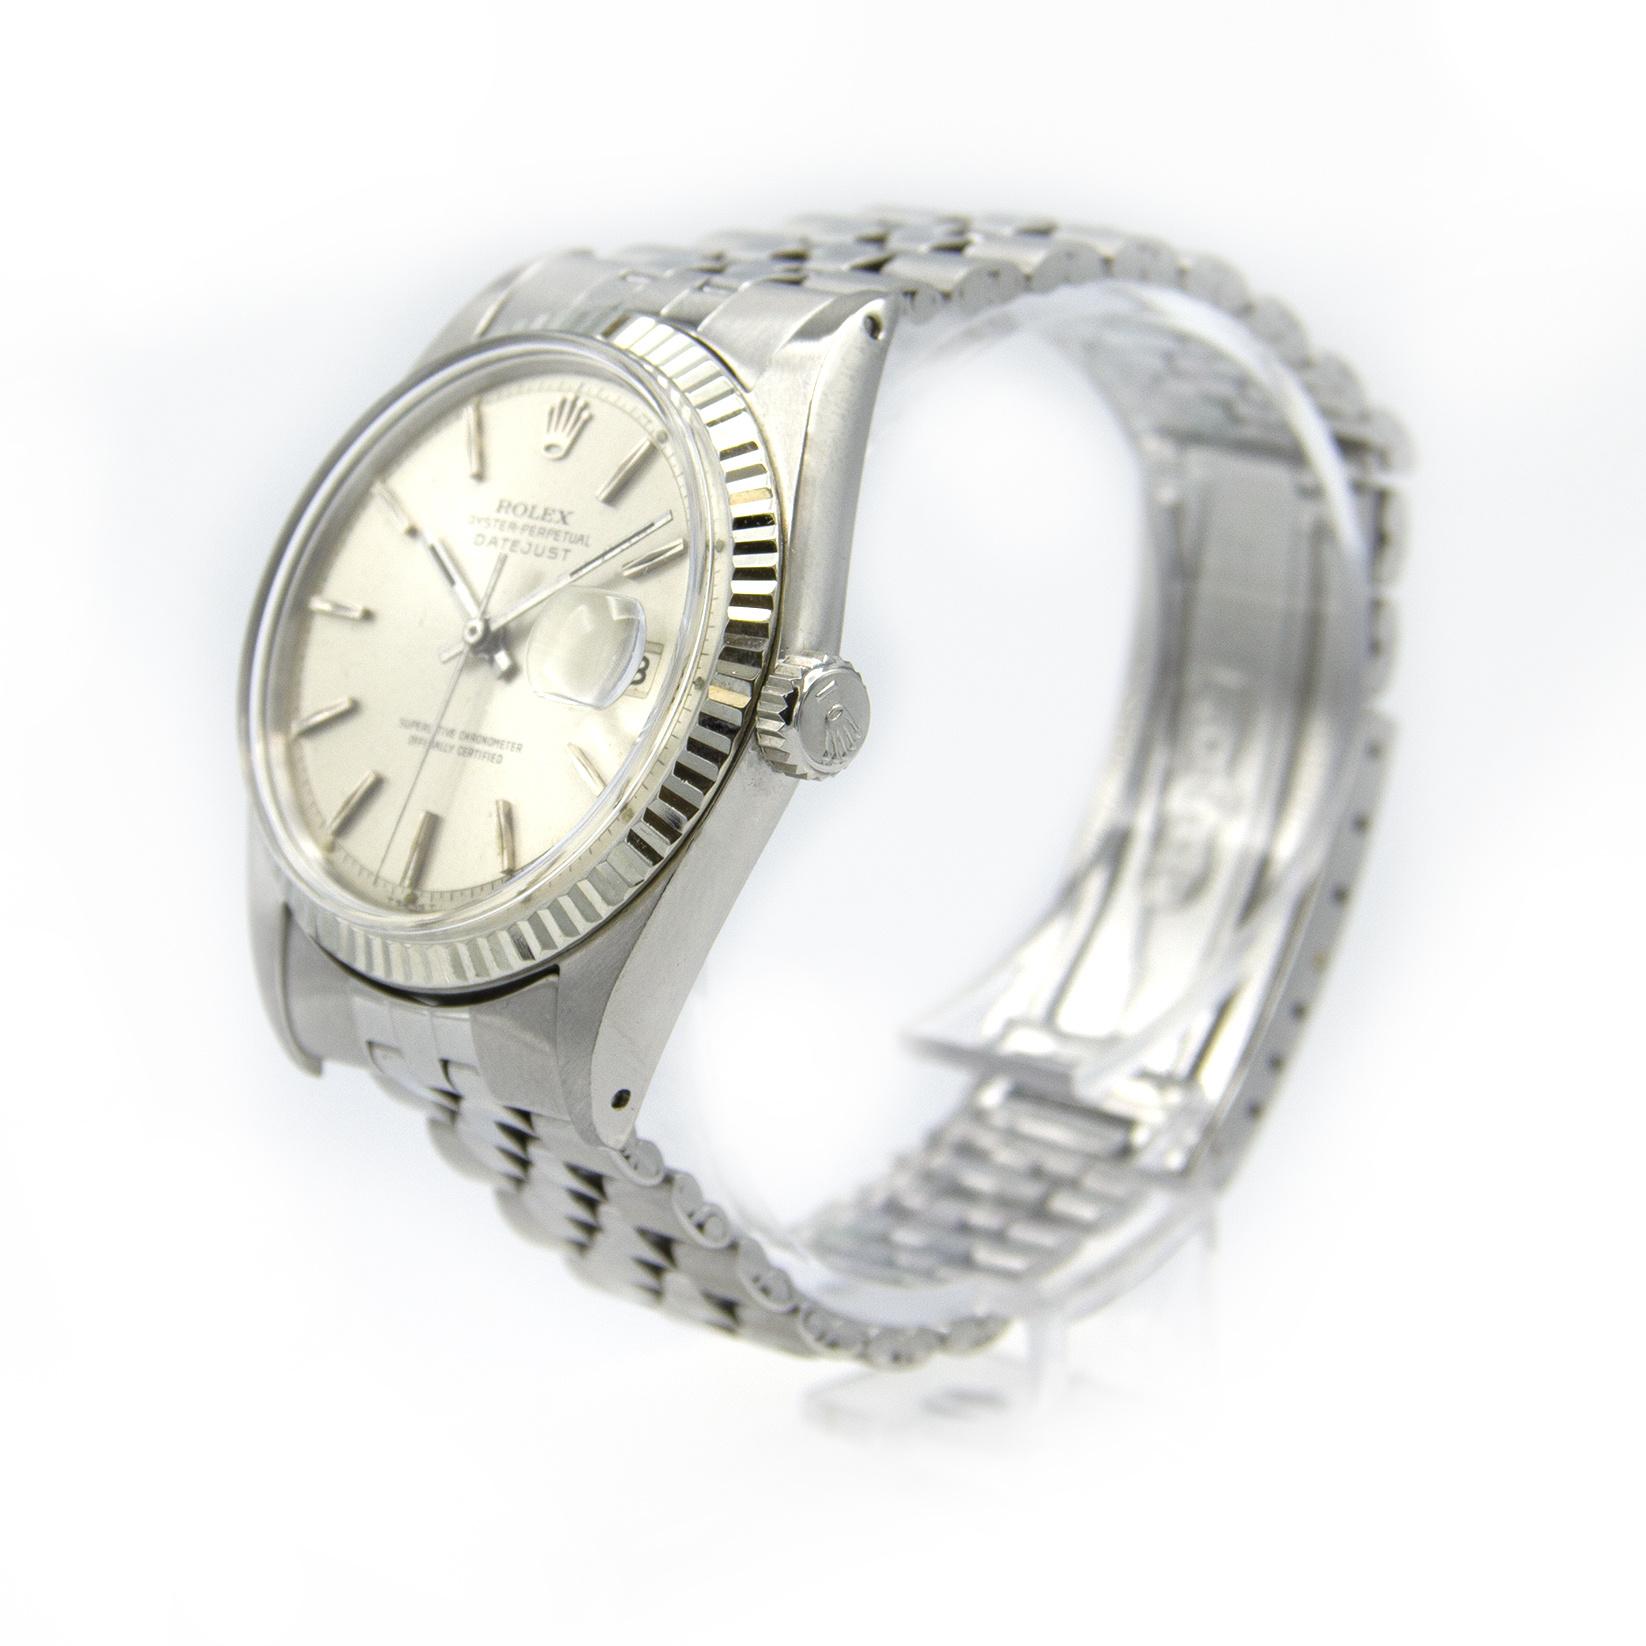 Rolex Datejust - 1601 - 36 mm-5